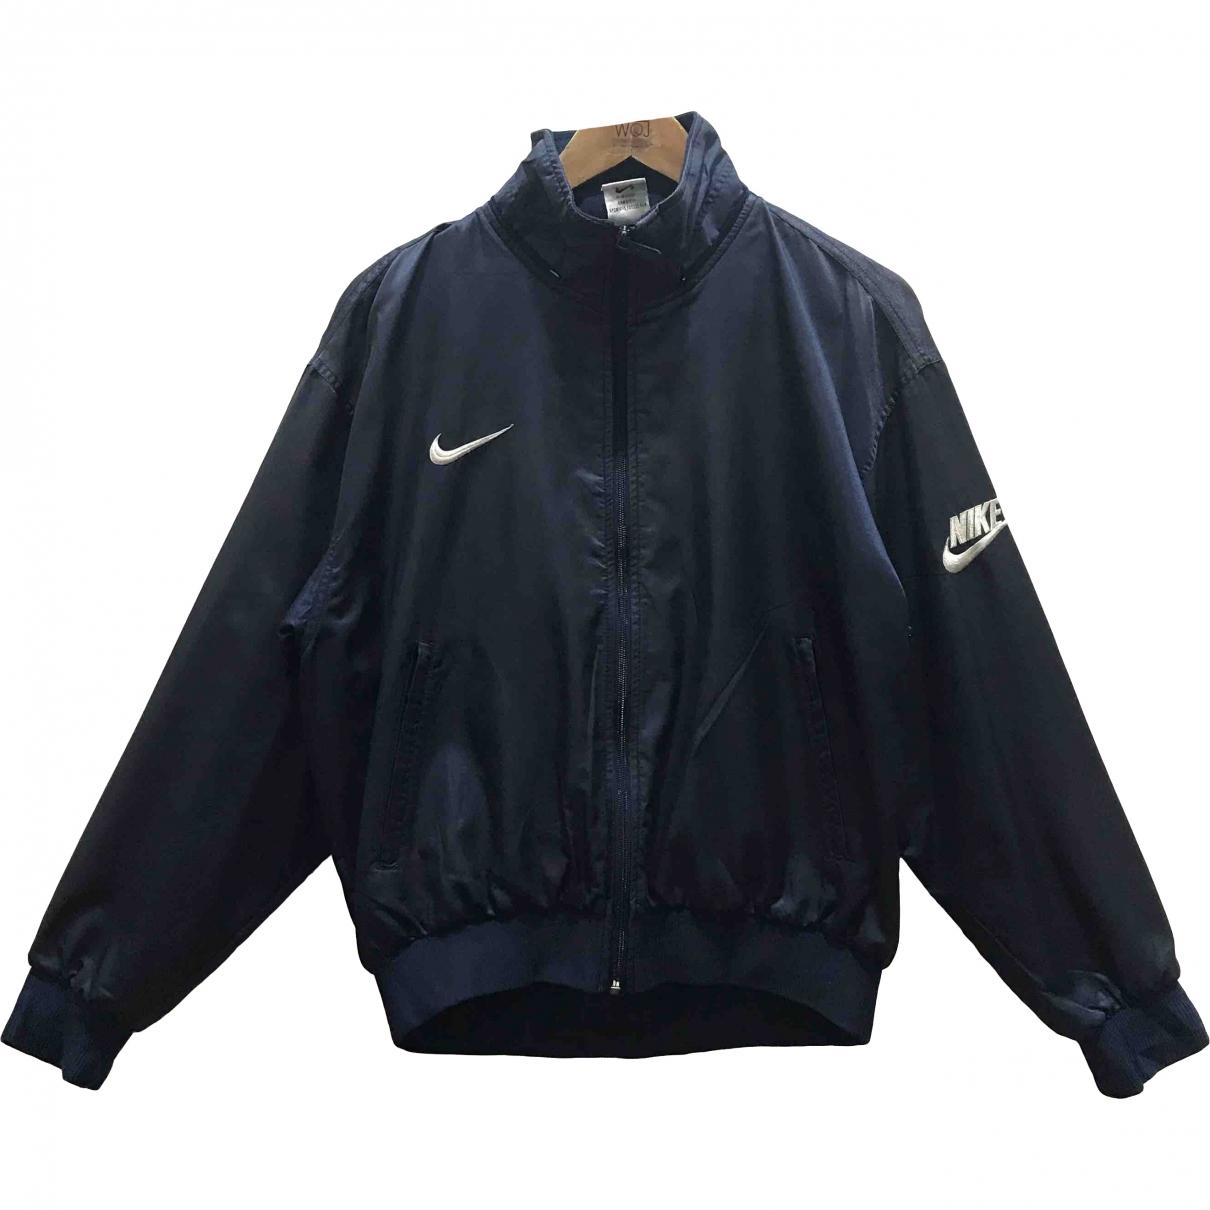 Nike \N Jacke in  Blau Baumwolle